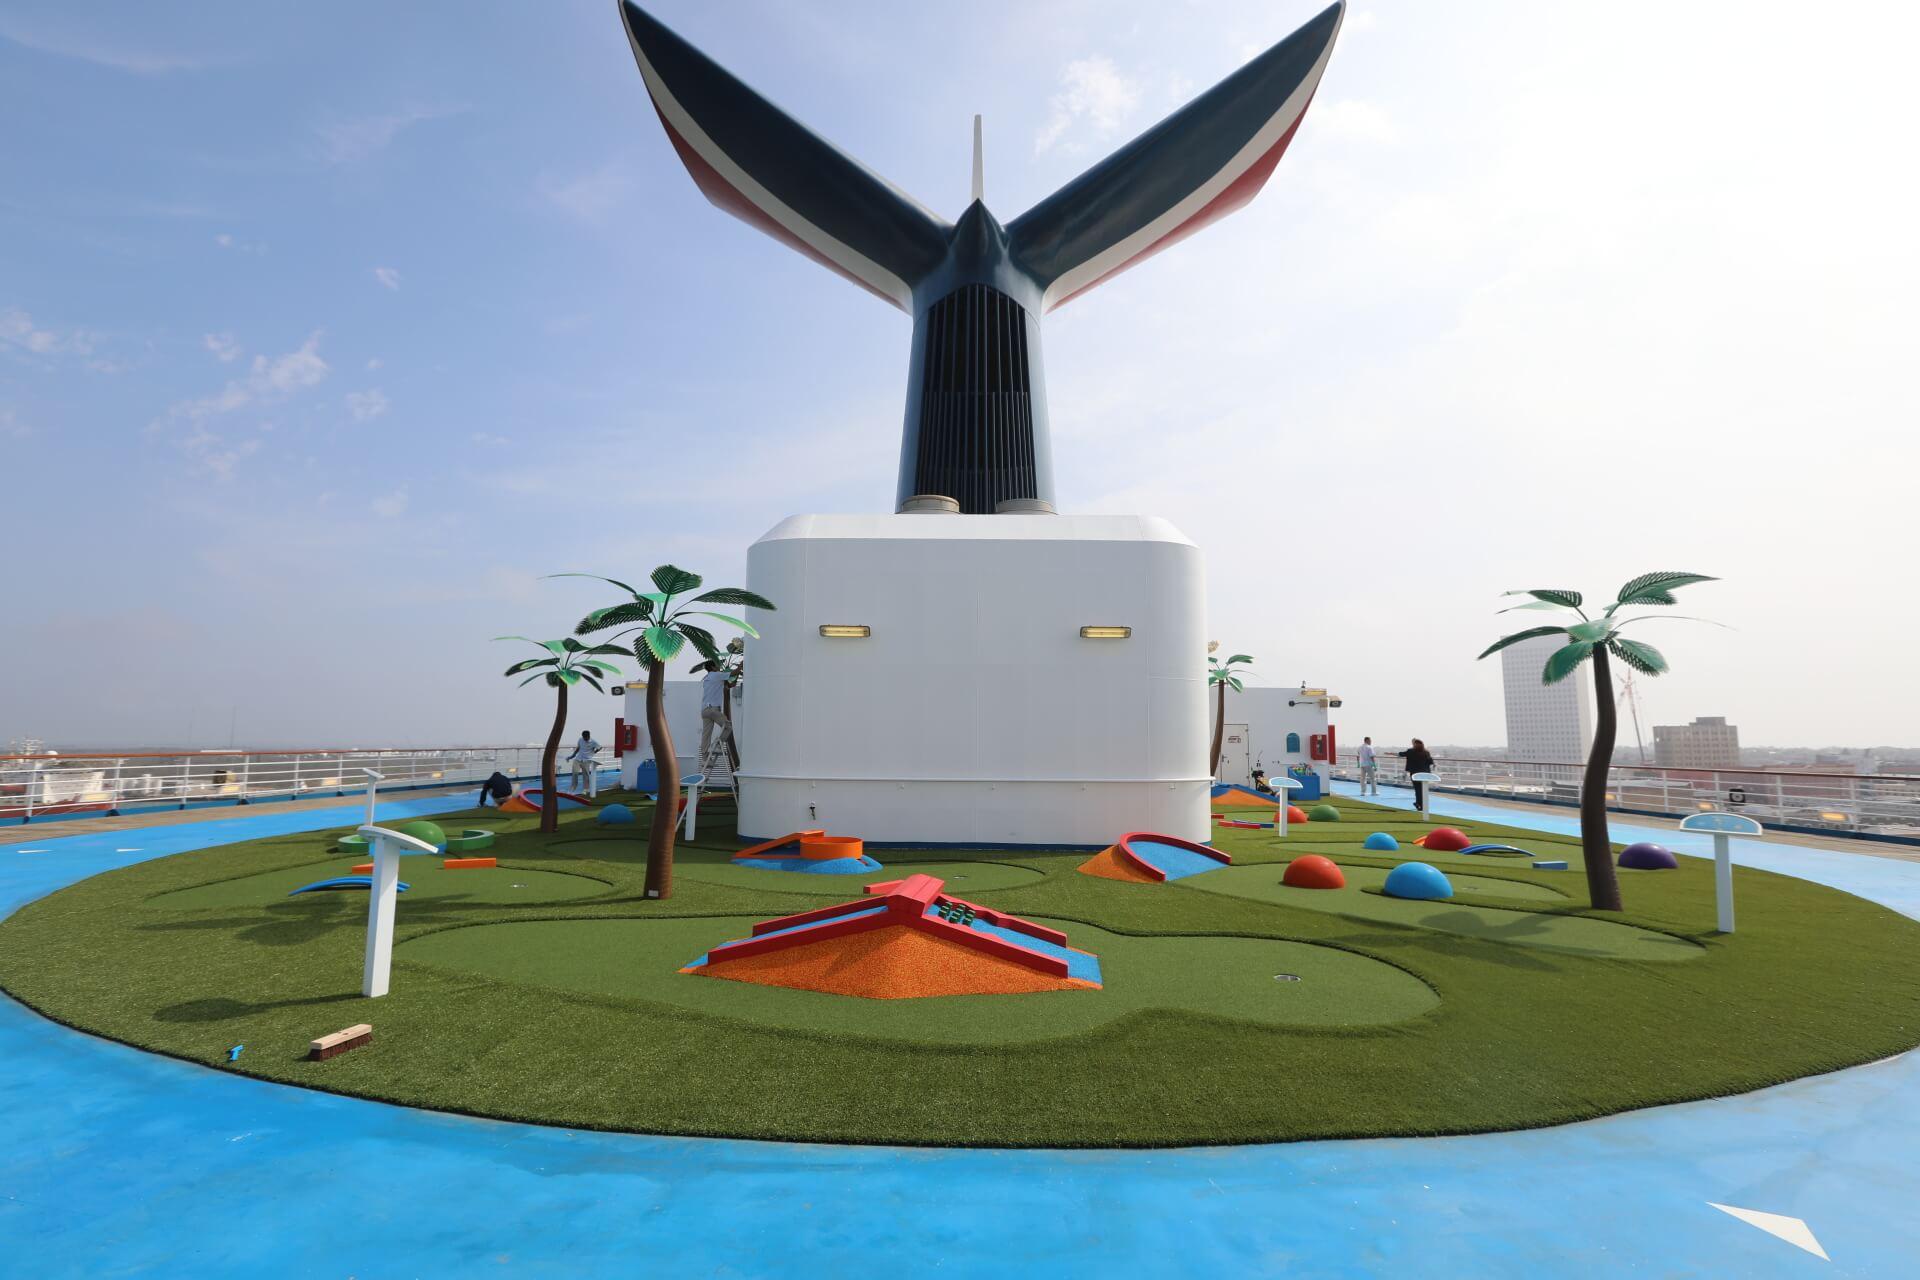 carnival freedom mini-golf